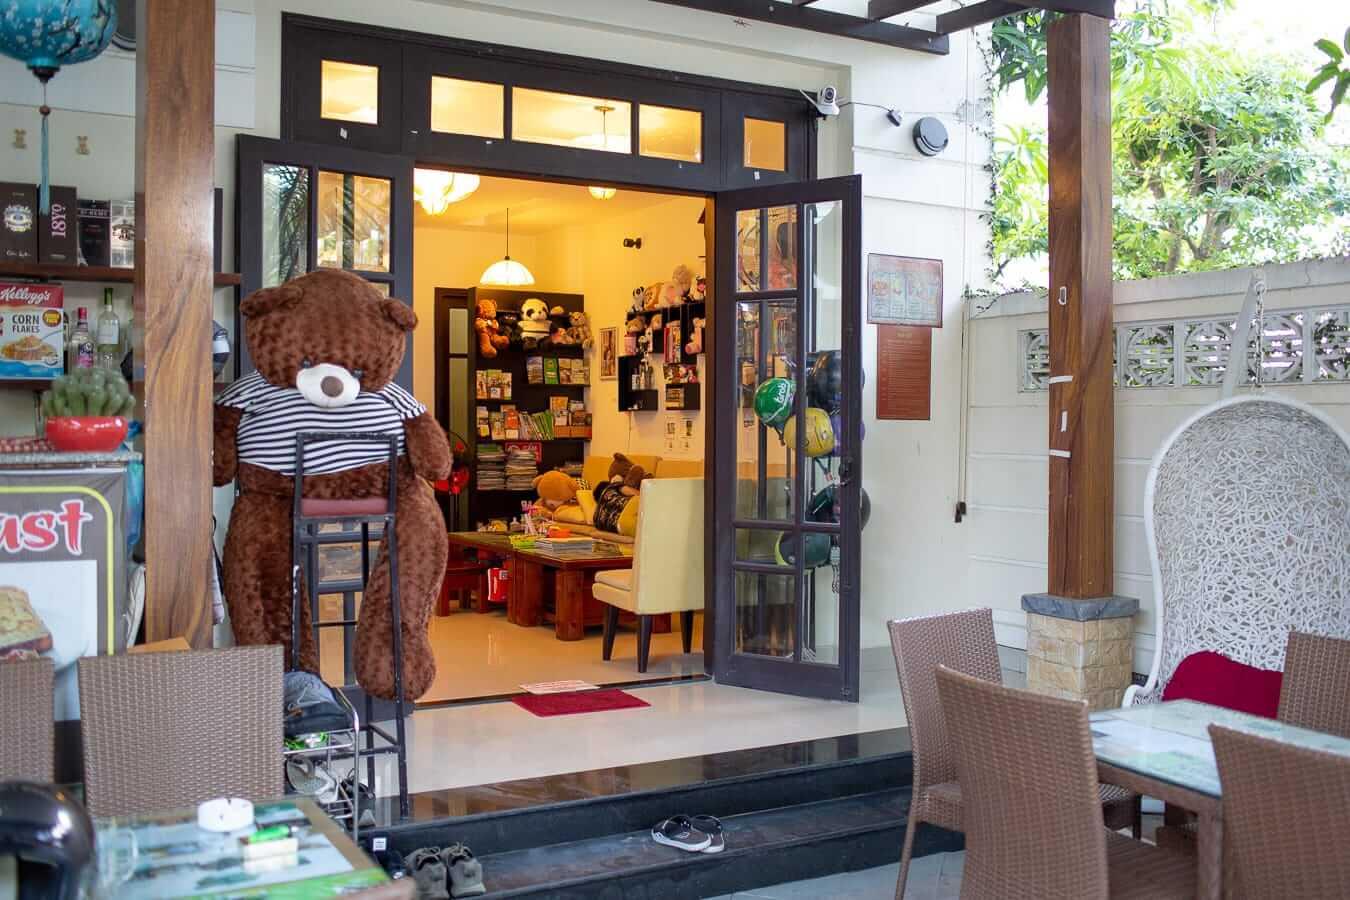 Lazy Bear Hostel: Hoi An Budget Accommodation